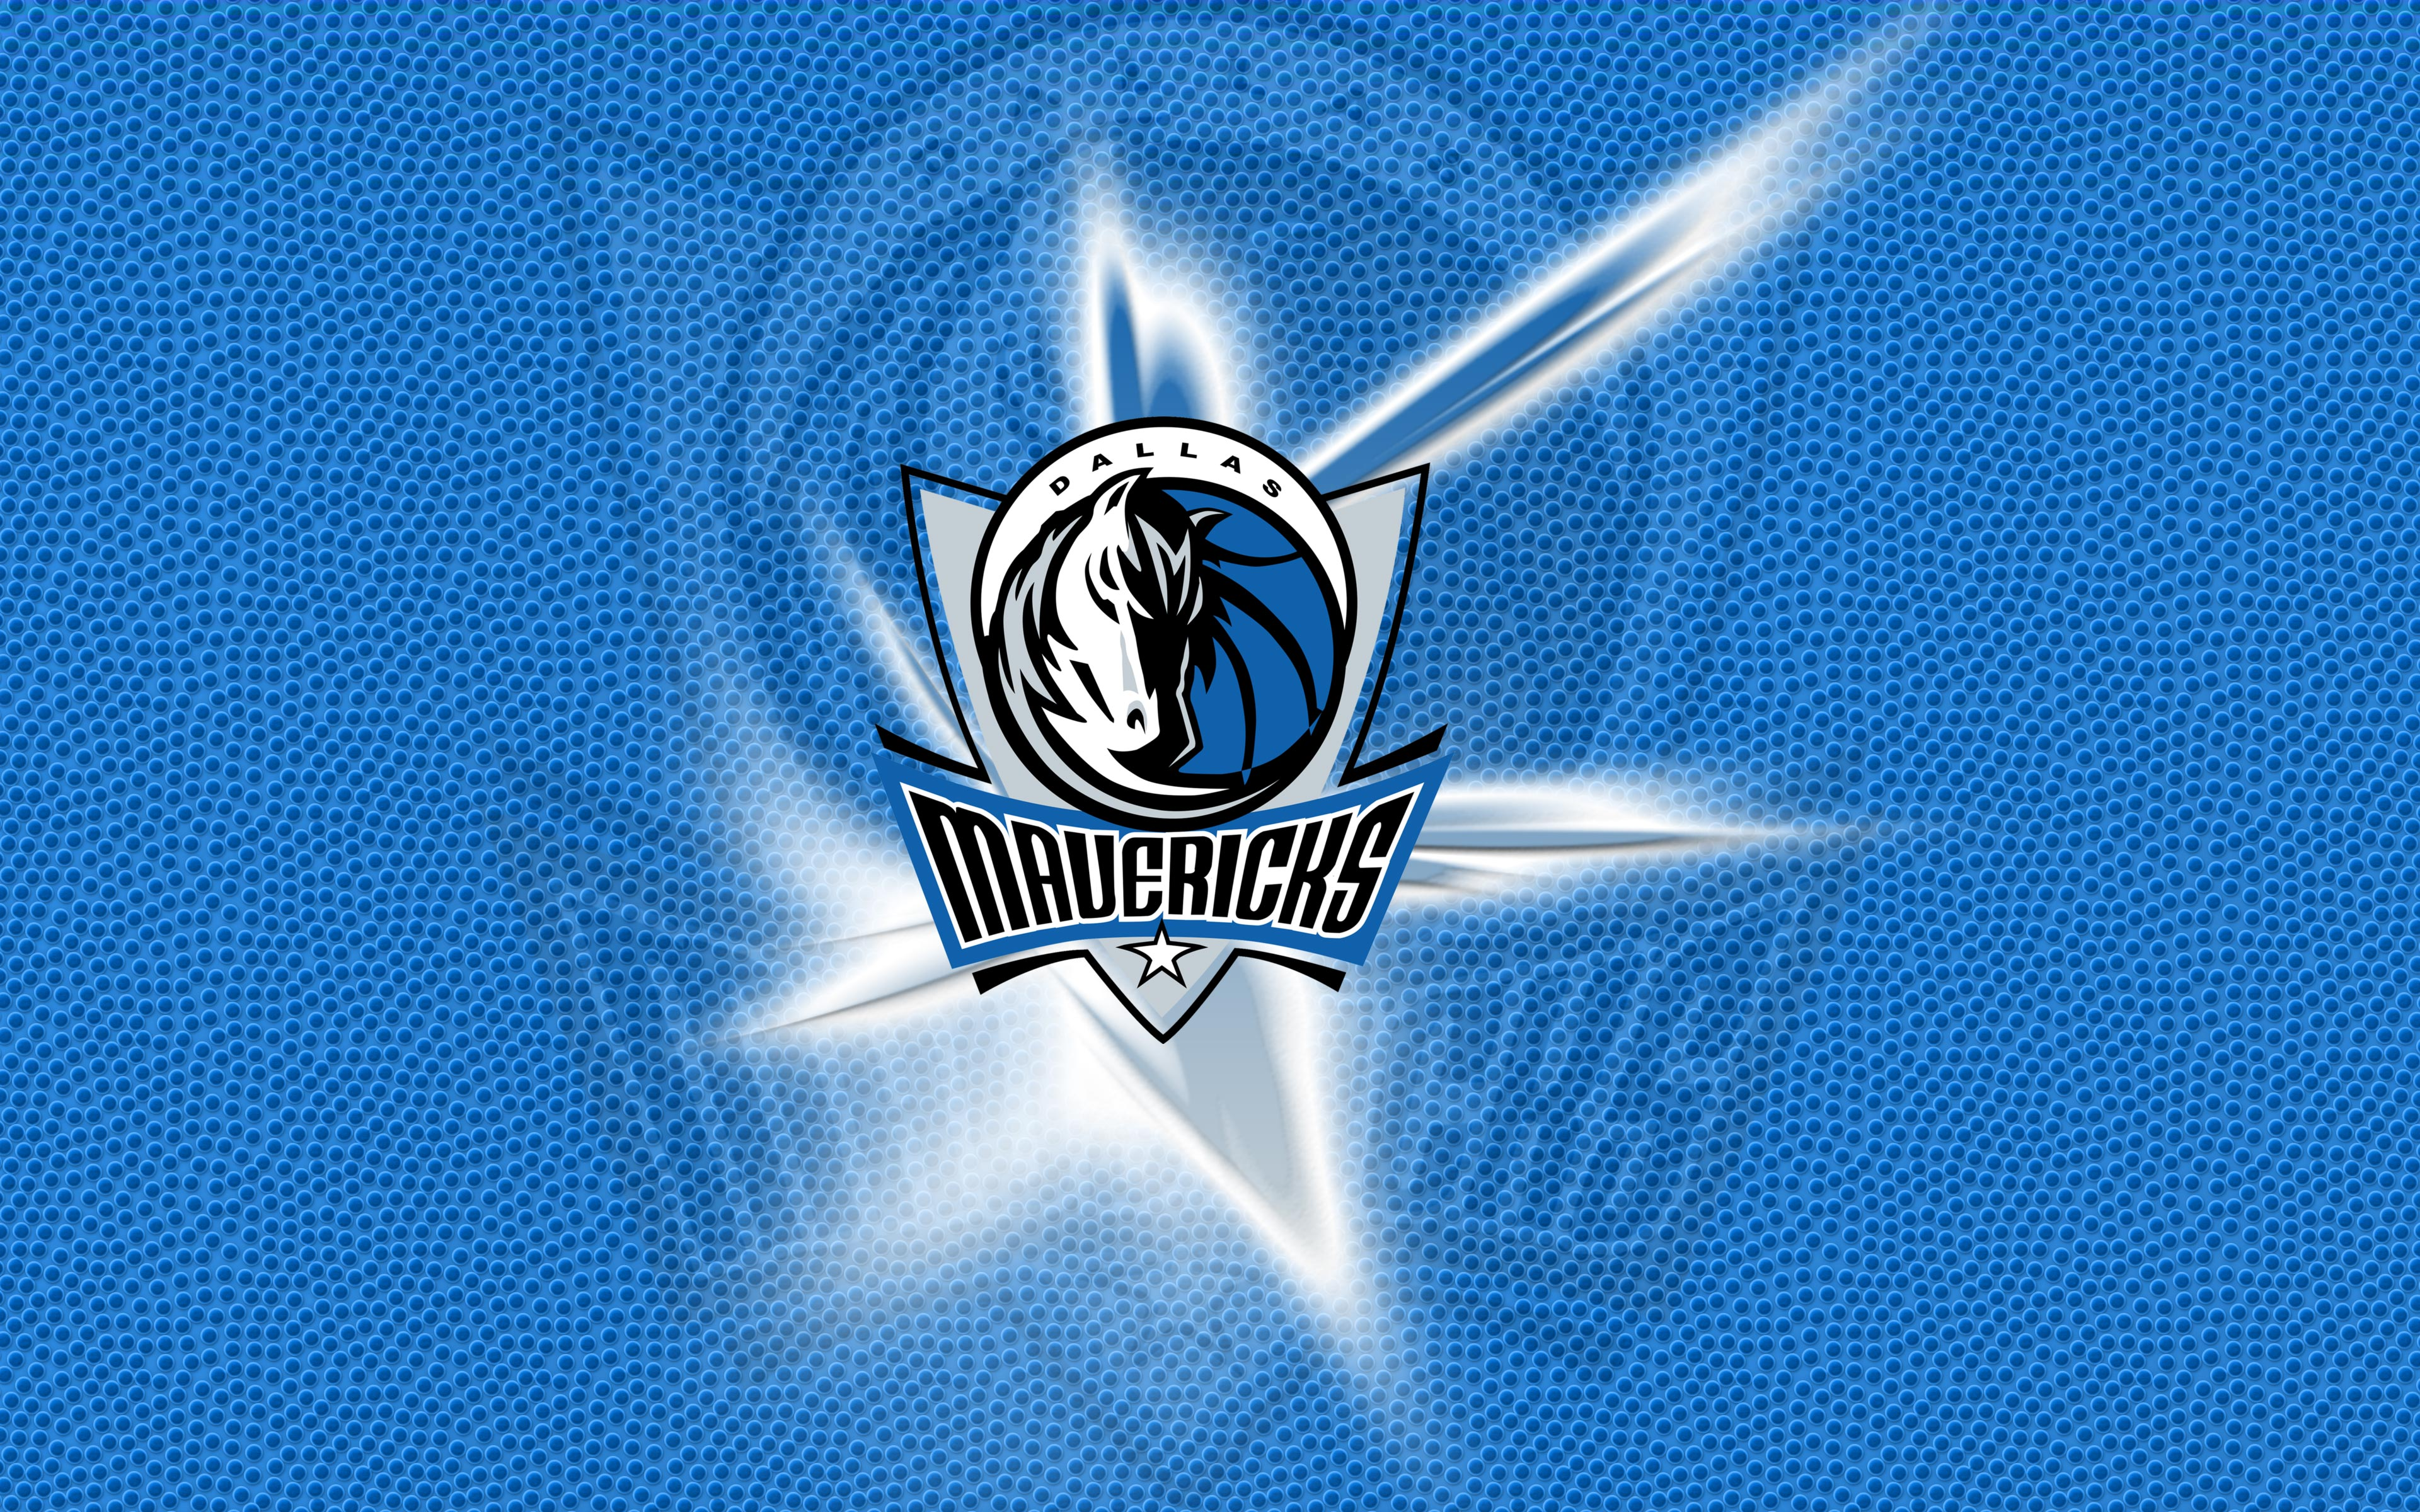 Dallas Mavericks Wallpapers High Quality Resolution - Wickedsa com